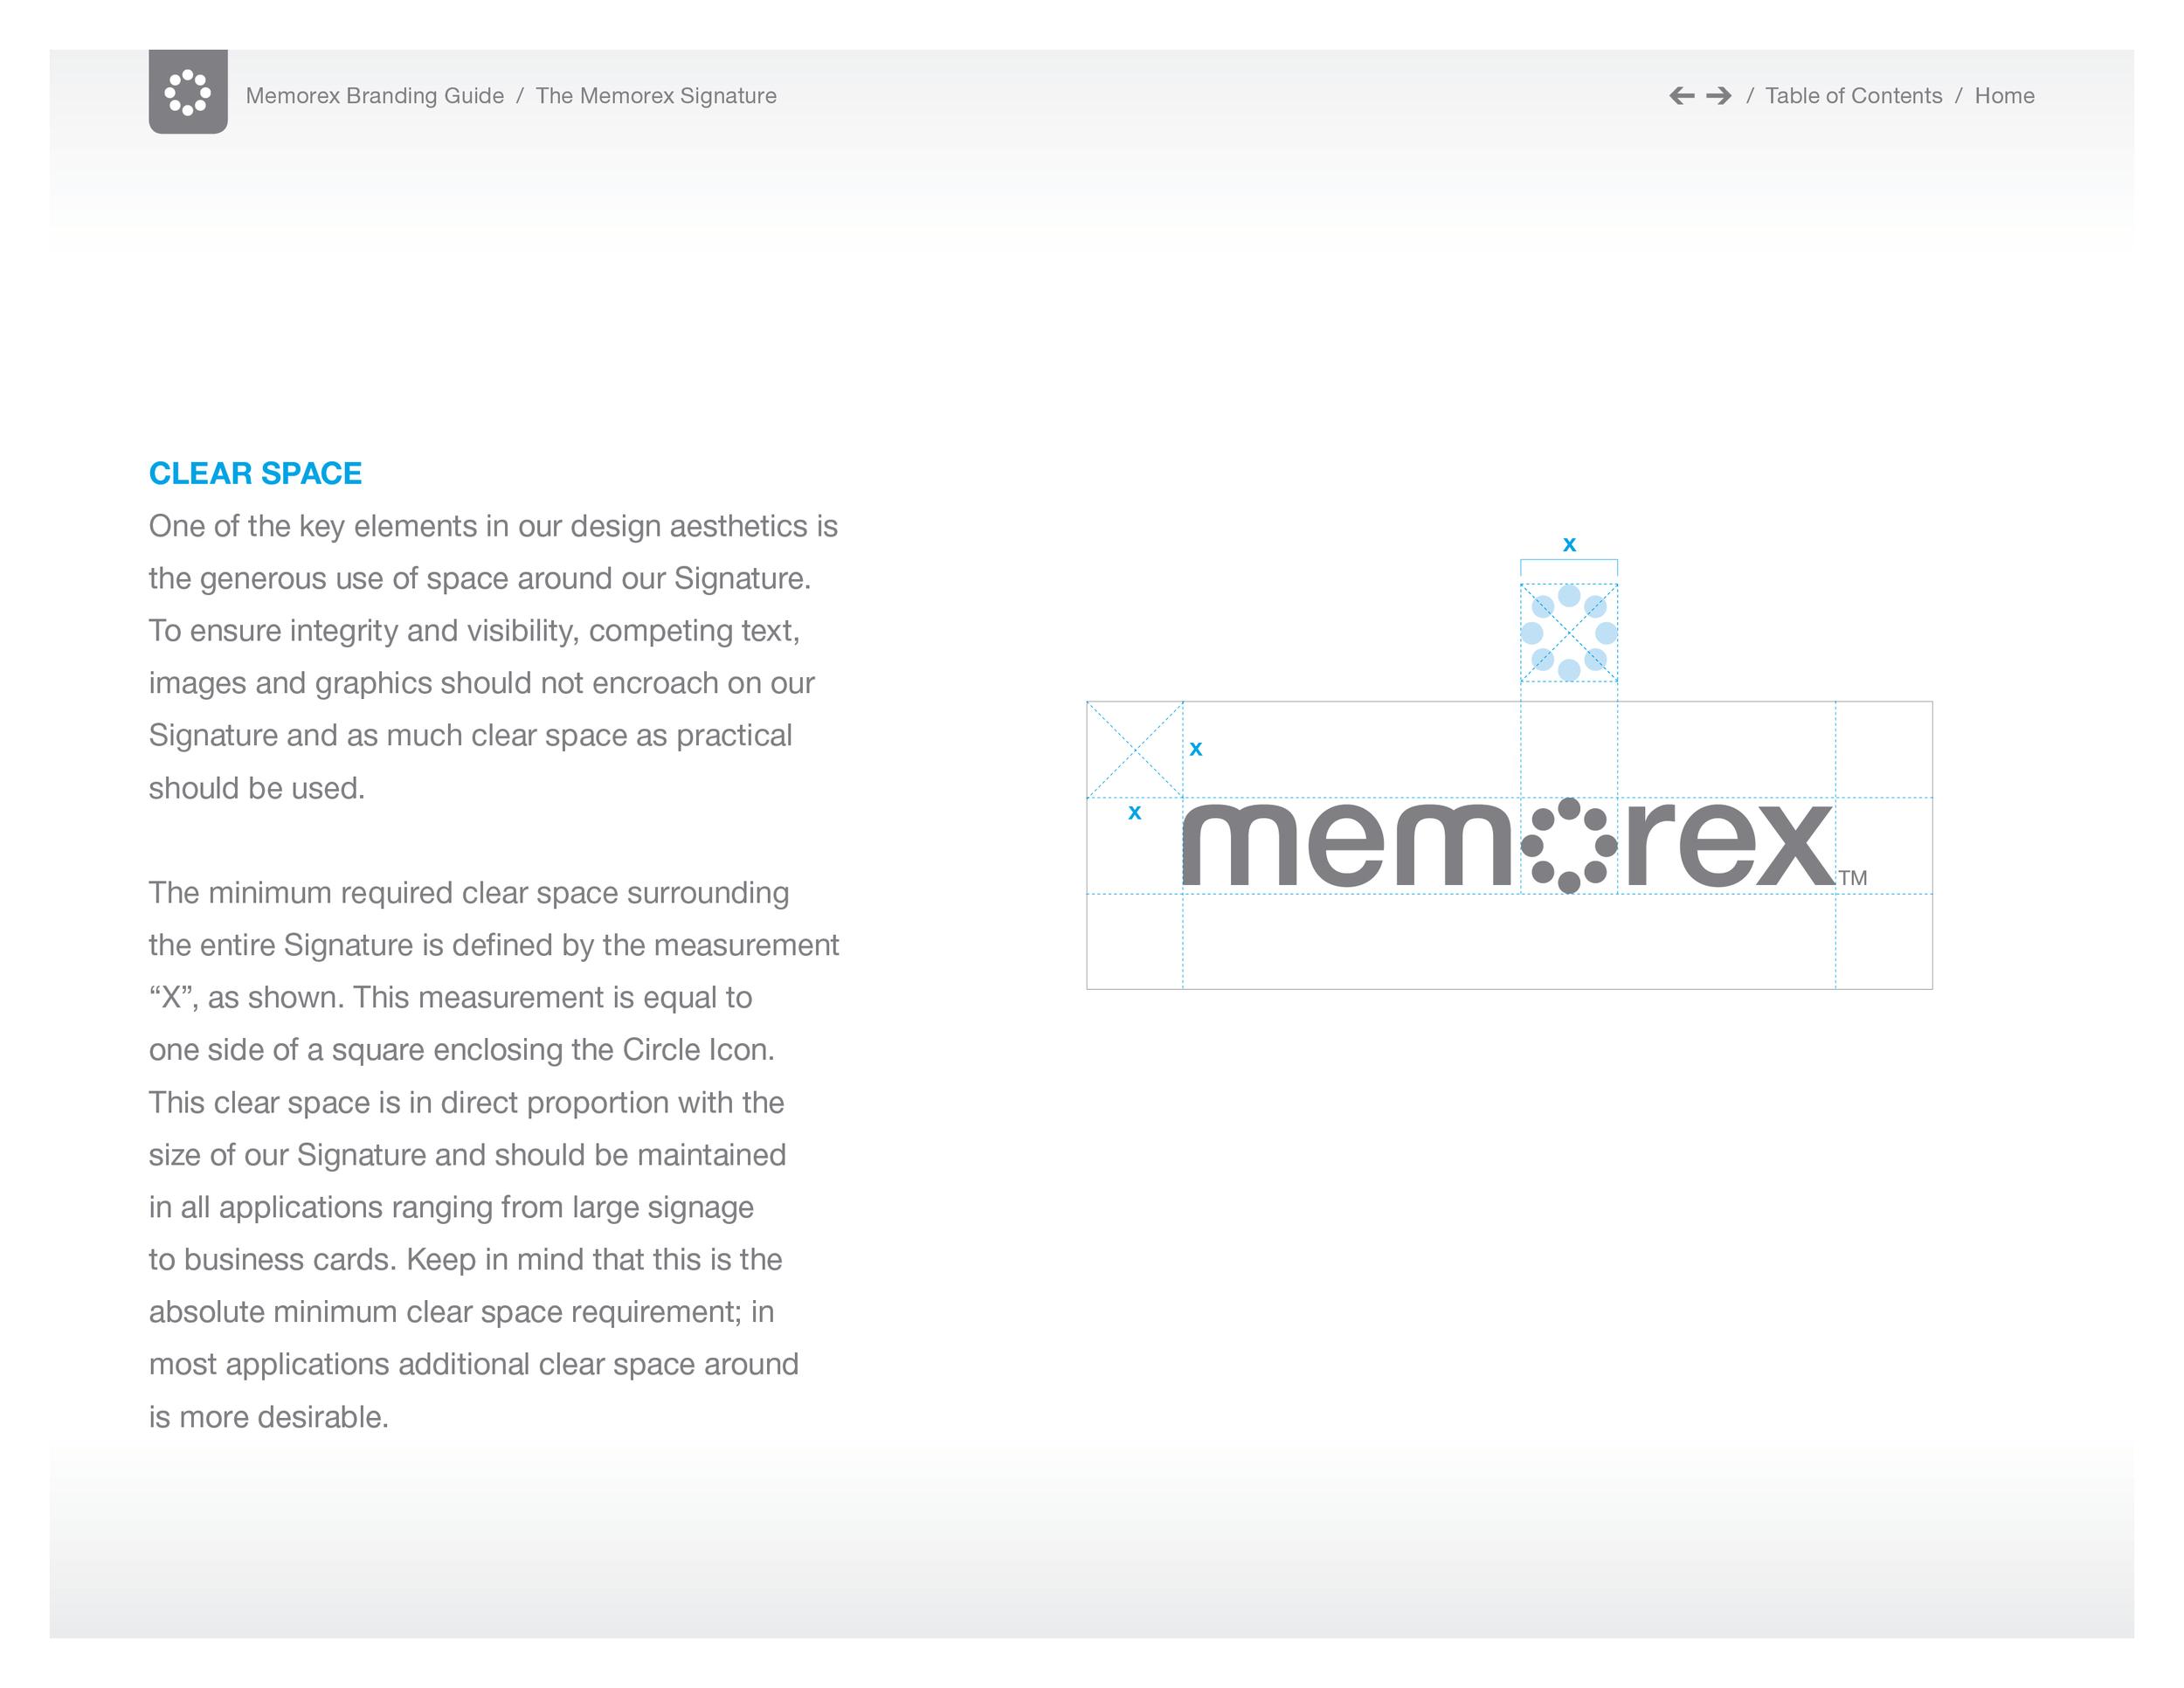 Memorex_StyleGuide05.jpg